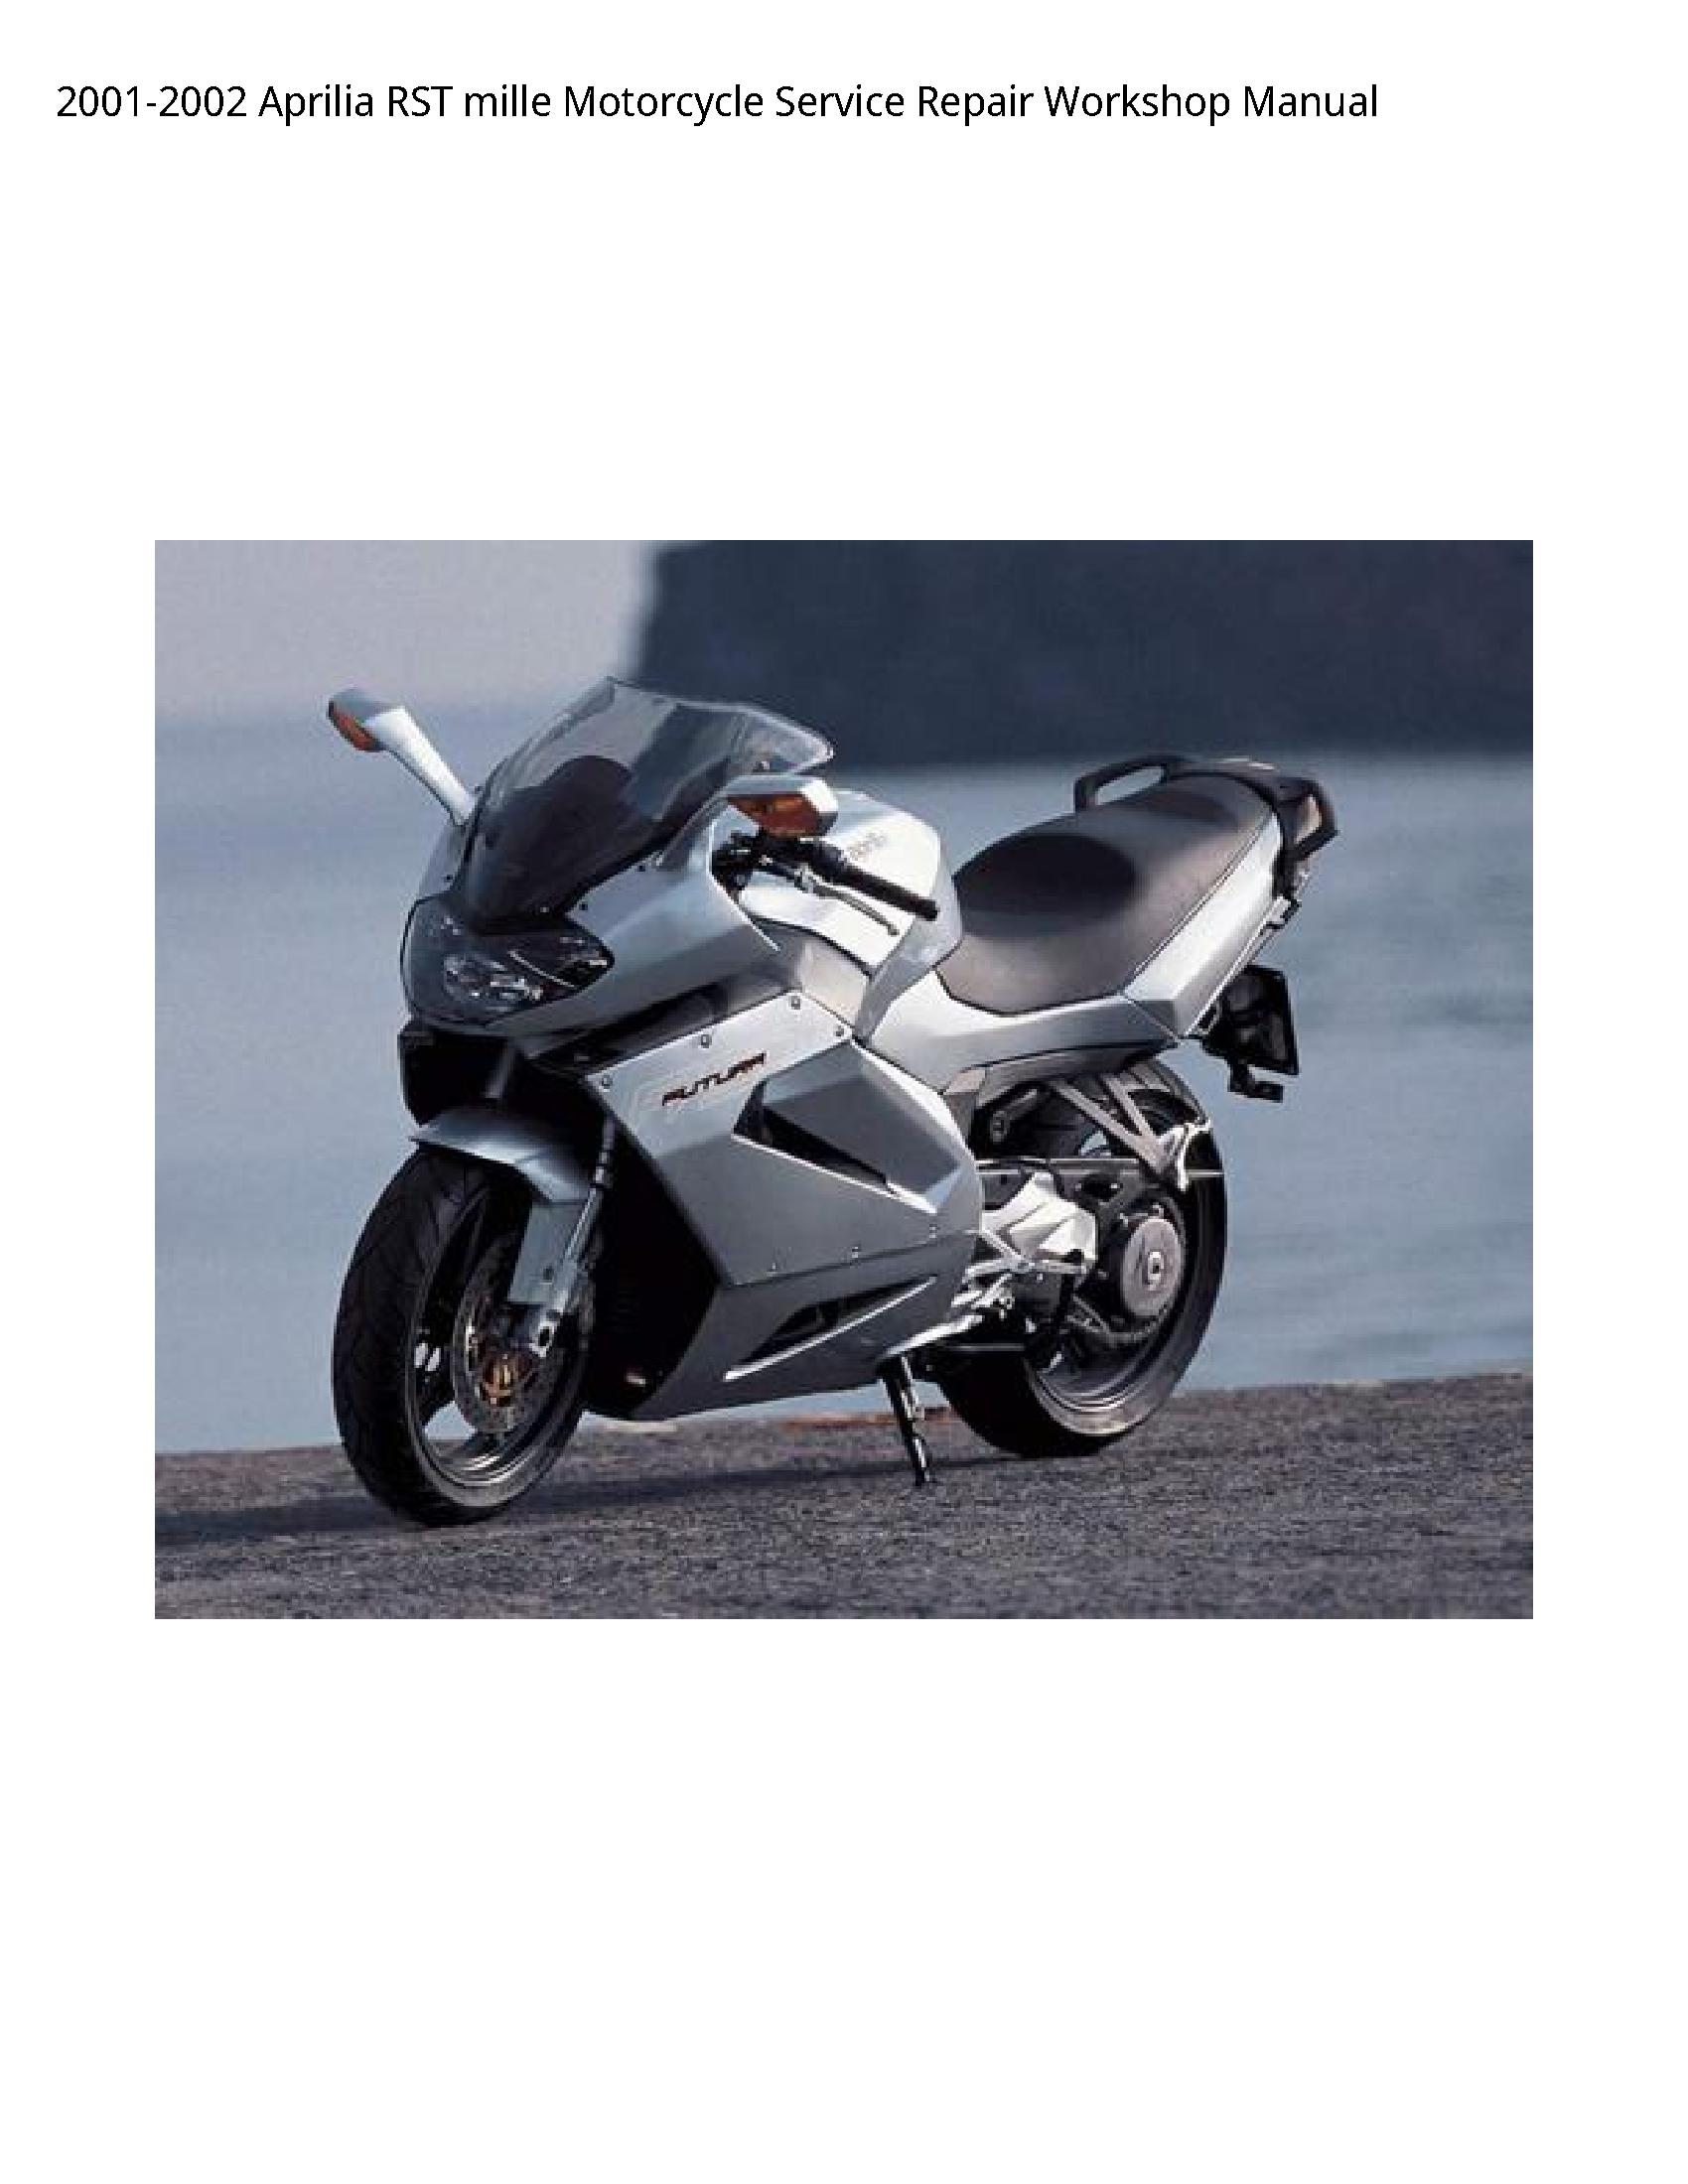 Aprilia RST mille Motorcycle manual